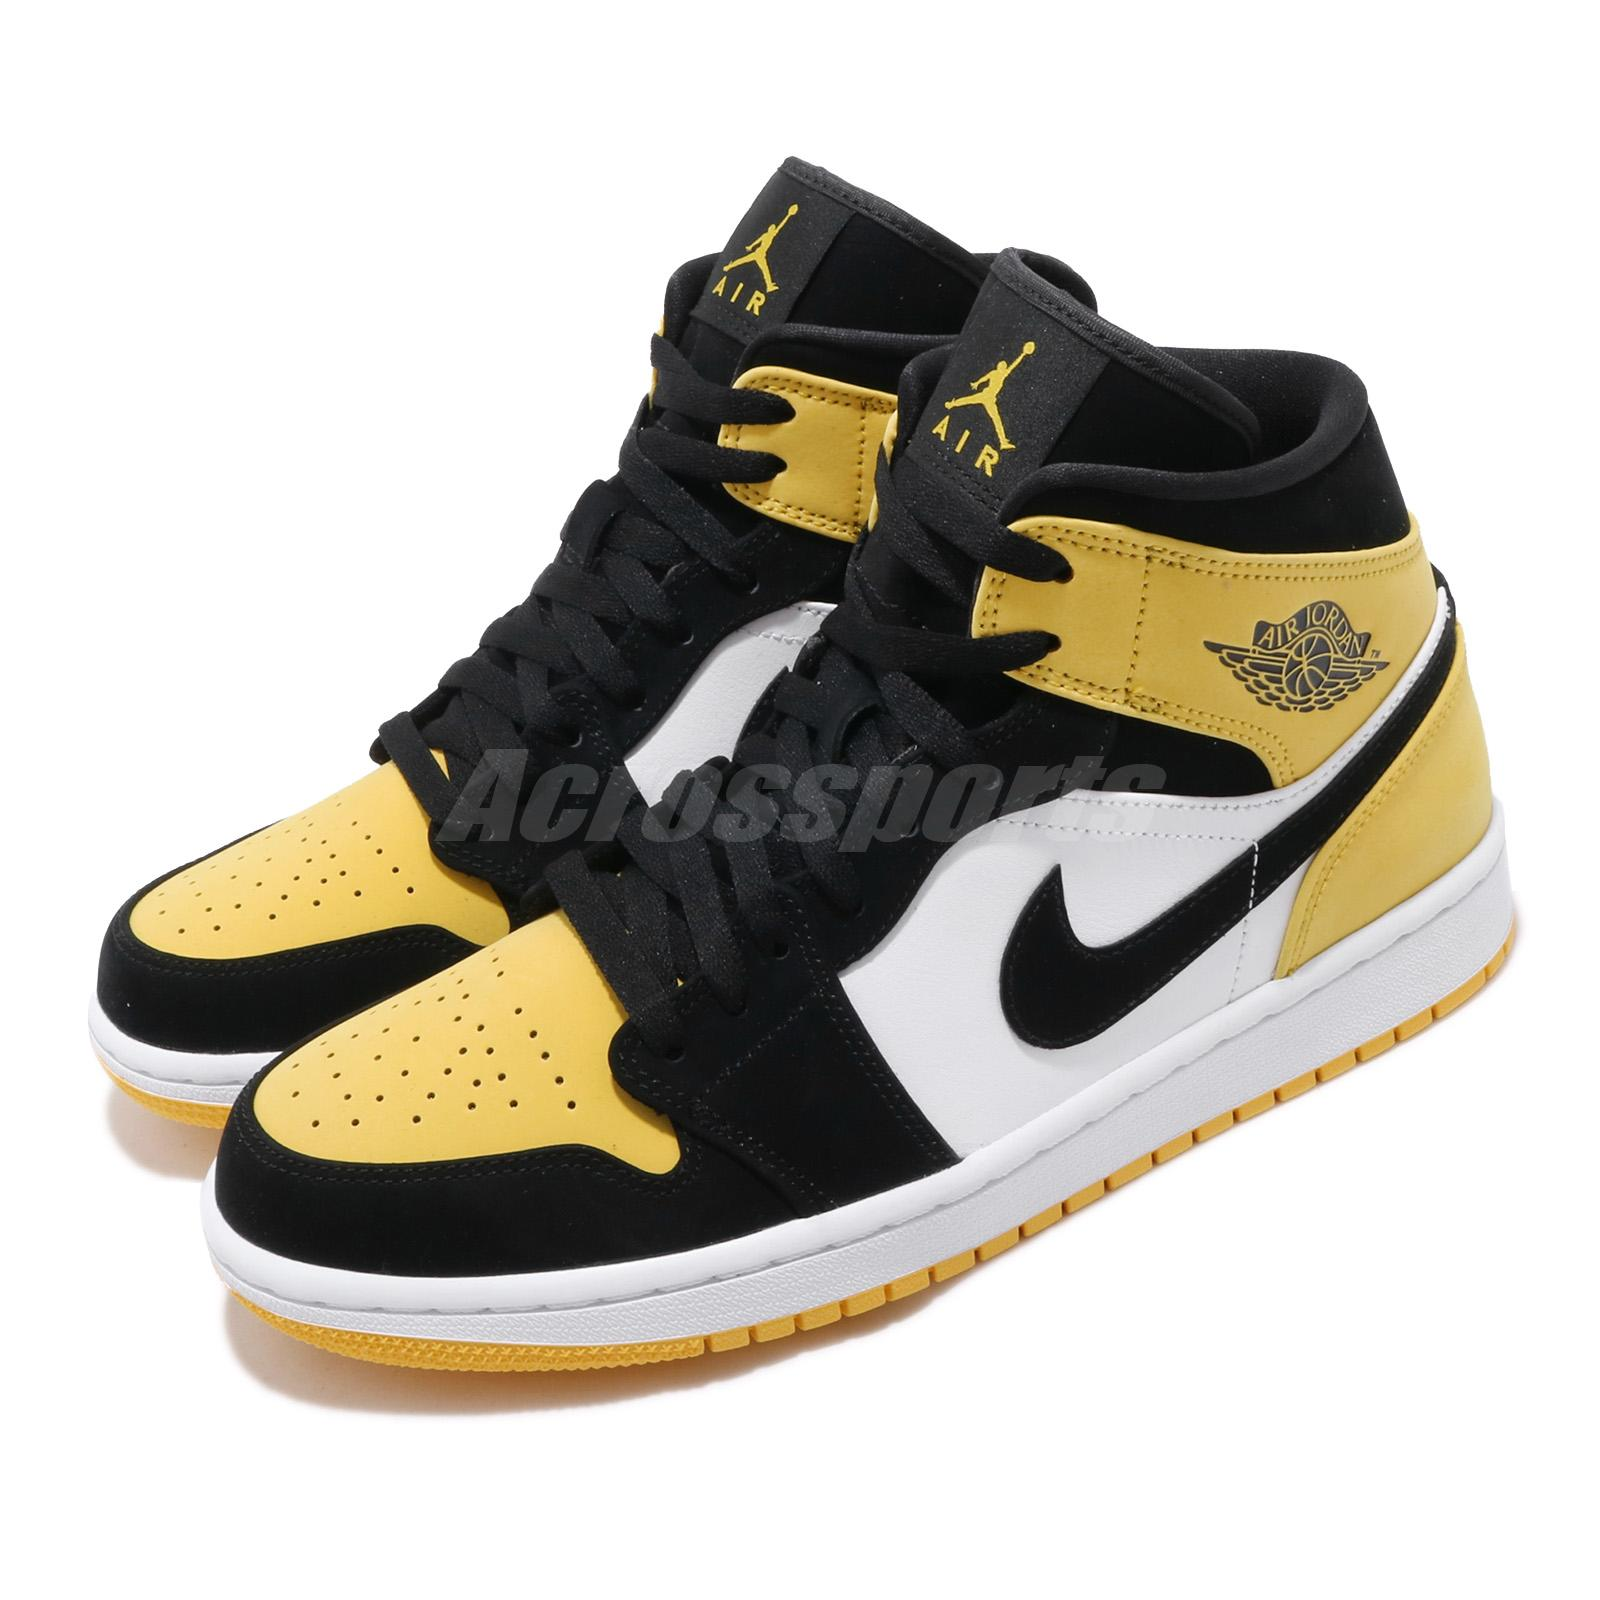 Najlepiej gorąca sprzedaż online ekskluzywne oferty Details about Nike Air Jordan 1 Mid SE I AJ1 Yellow Toe Black Men Shoes  Sneakers 852542-071